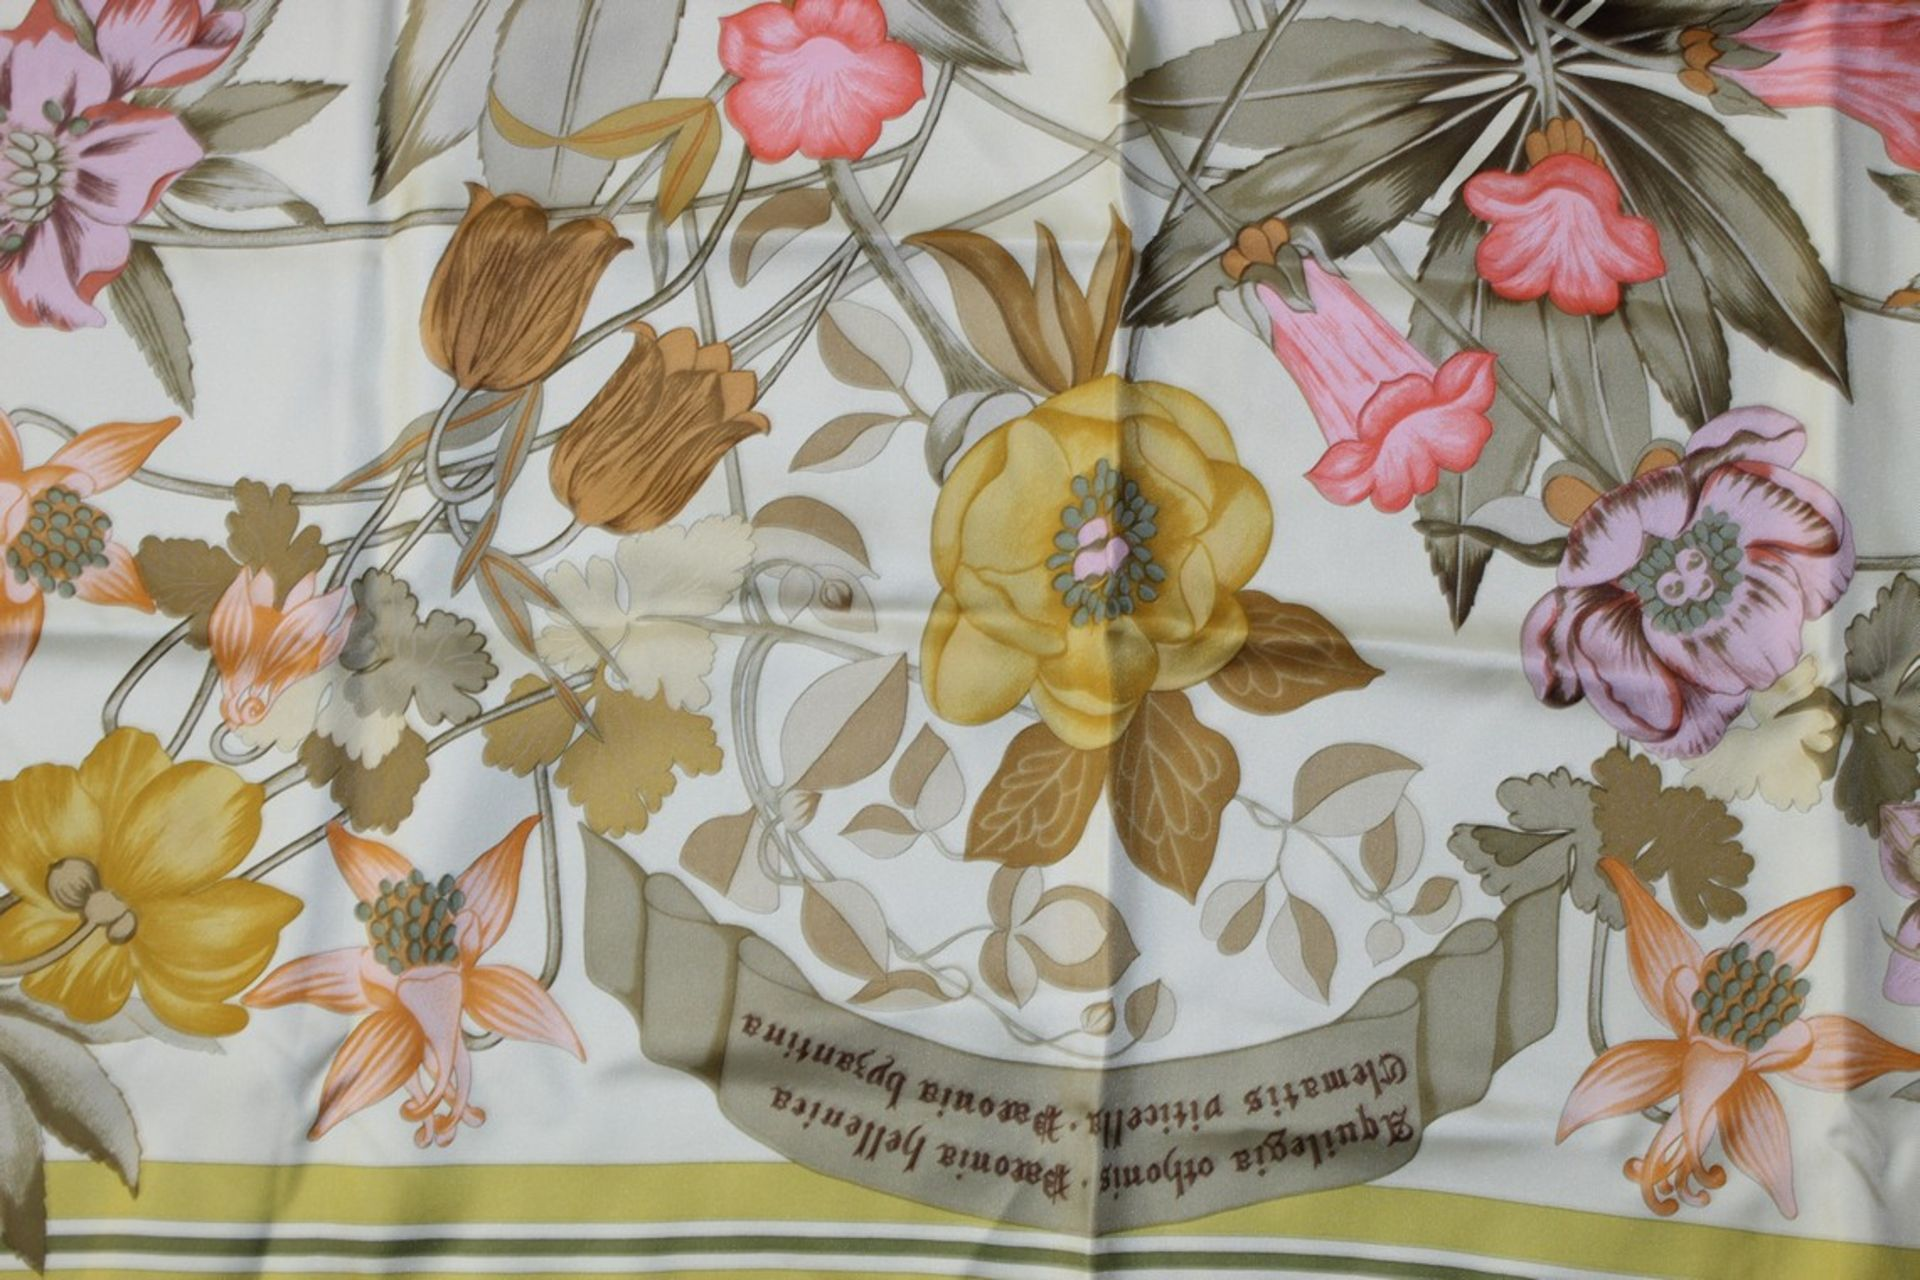 RRP £680 Hermes 100% Twill Silk Scarf, Aquilegia Othonis By Niki Goulandris, Yellow/Green, 90X90Cm - Image 2 of 5